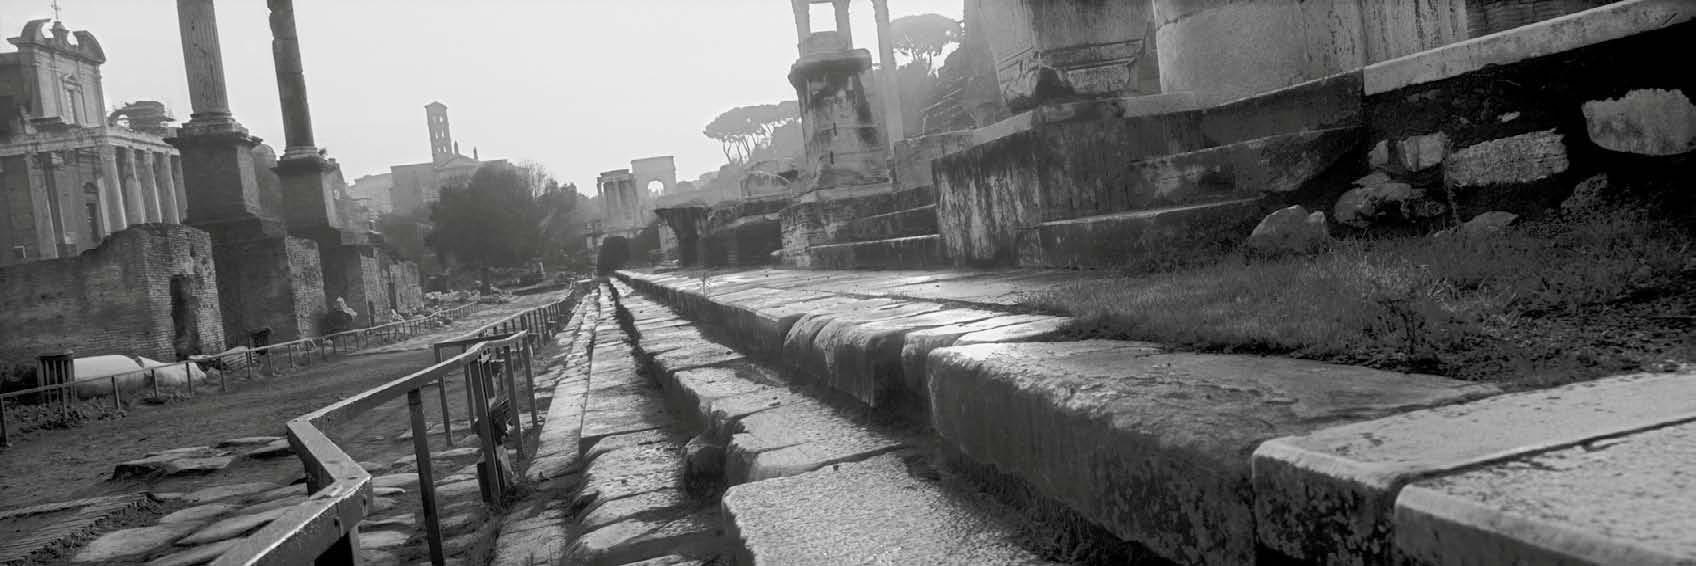 Roma, Italia, 2000. © Josef Koudelka Magnum Photos